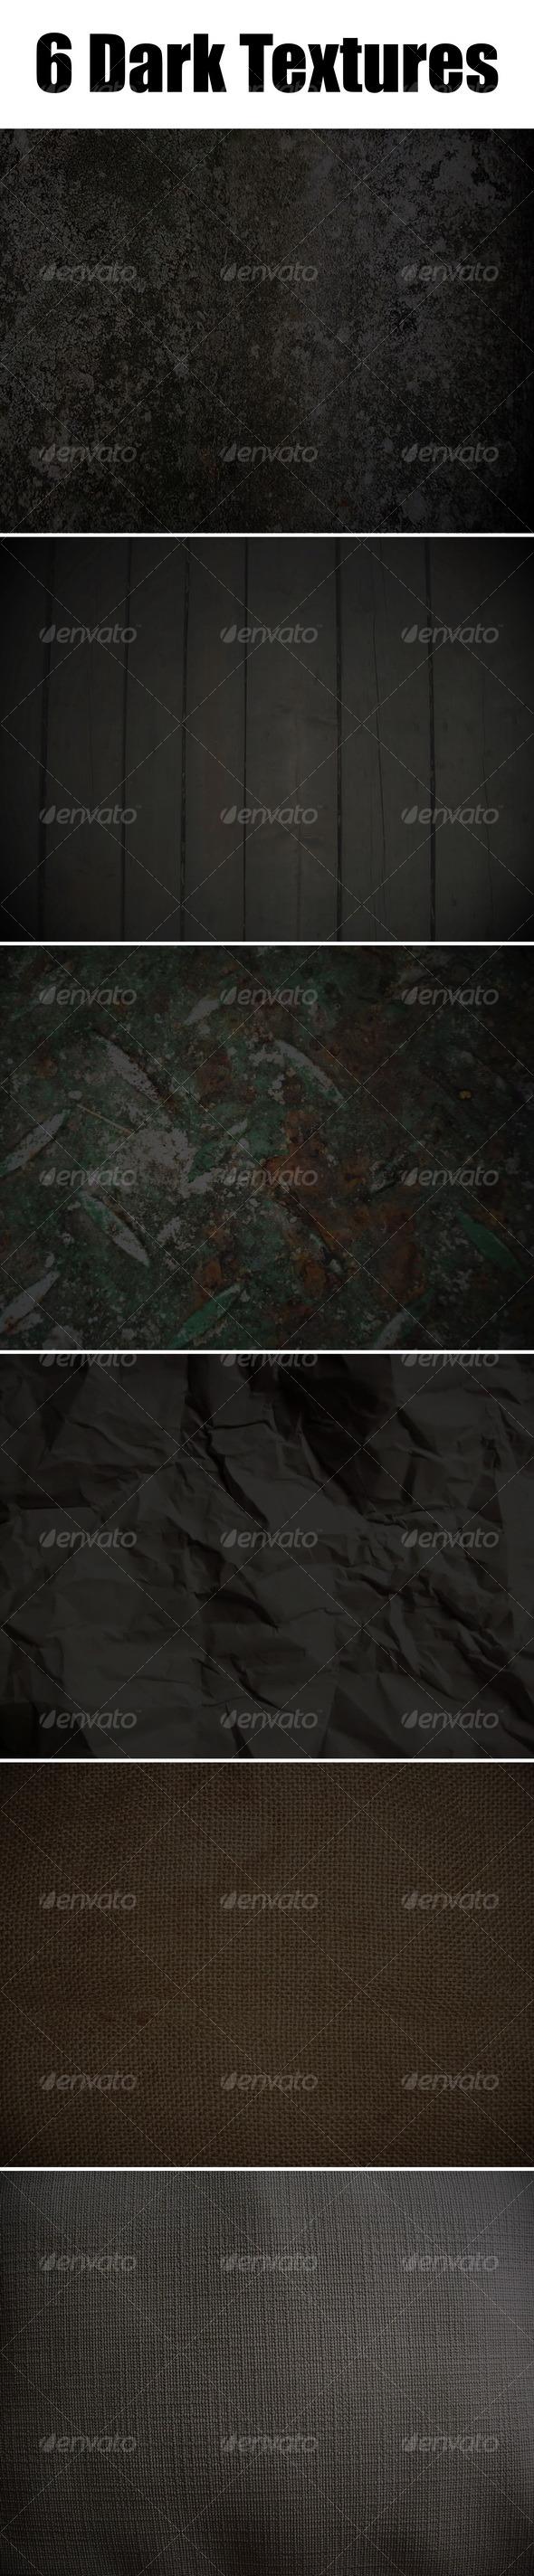 6 Dark Textures - Miscellaneous Textures